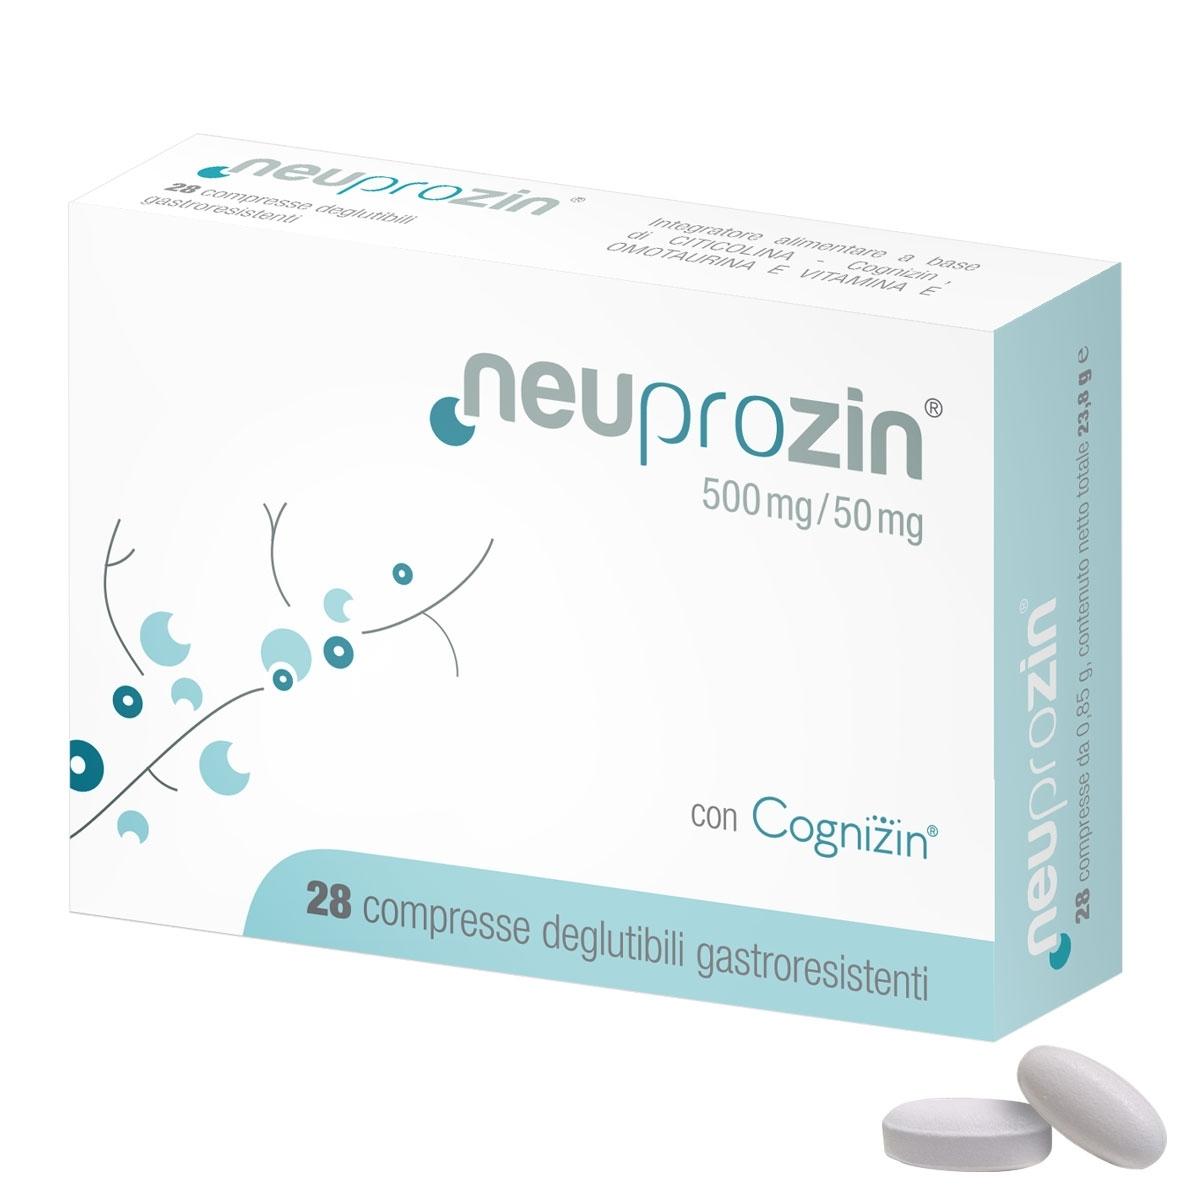 Neuprozin Integratore Alimentare 28 Compresse